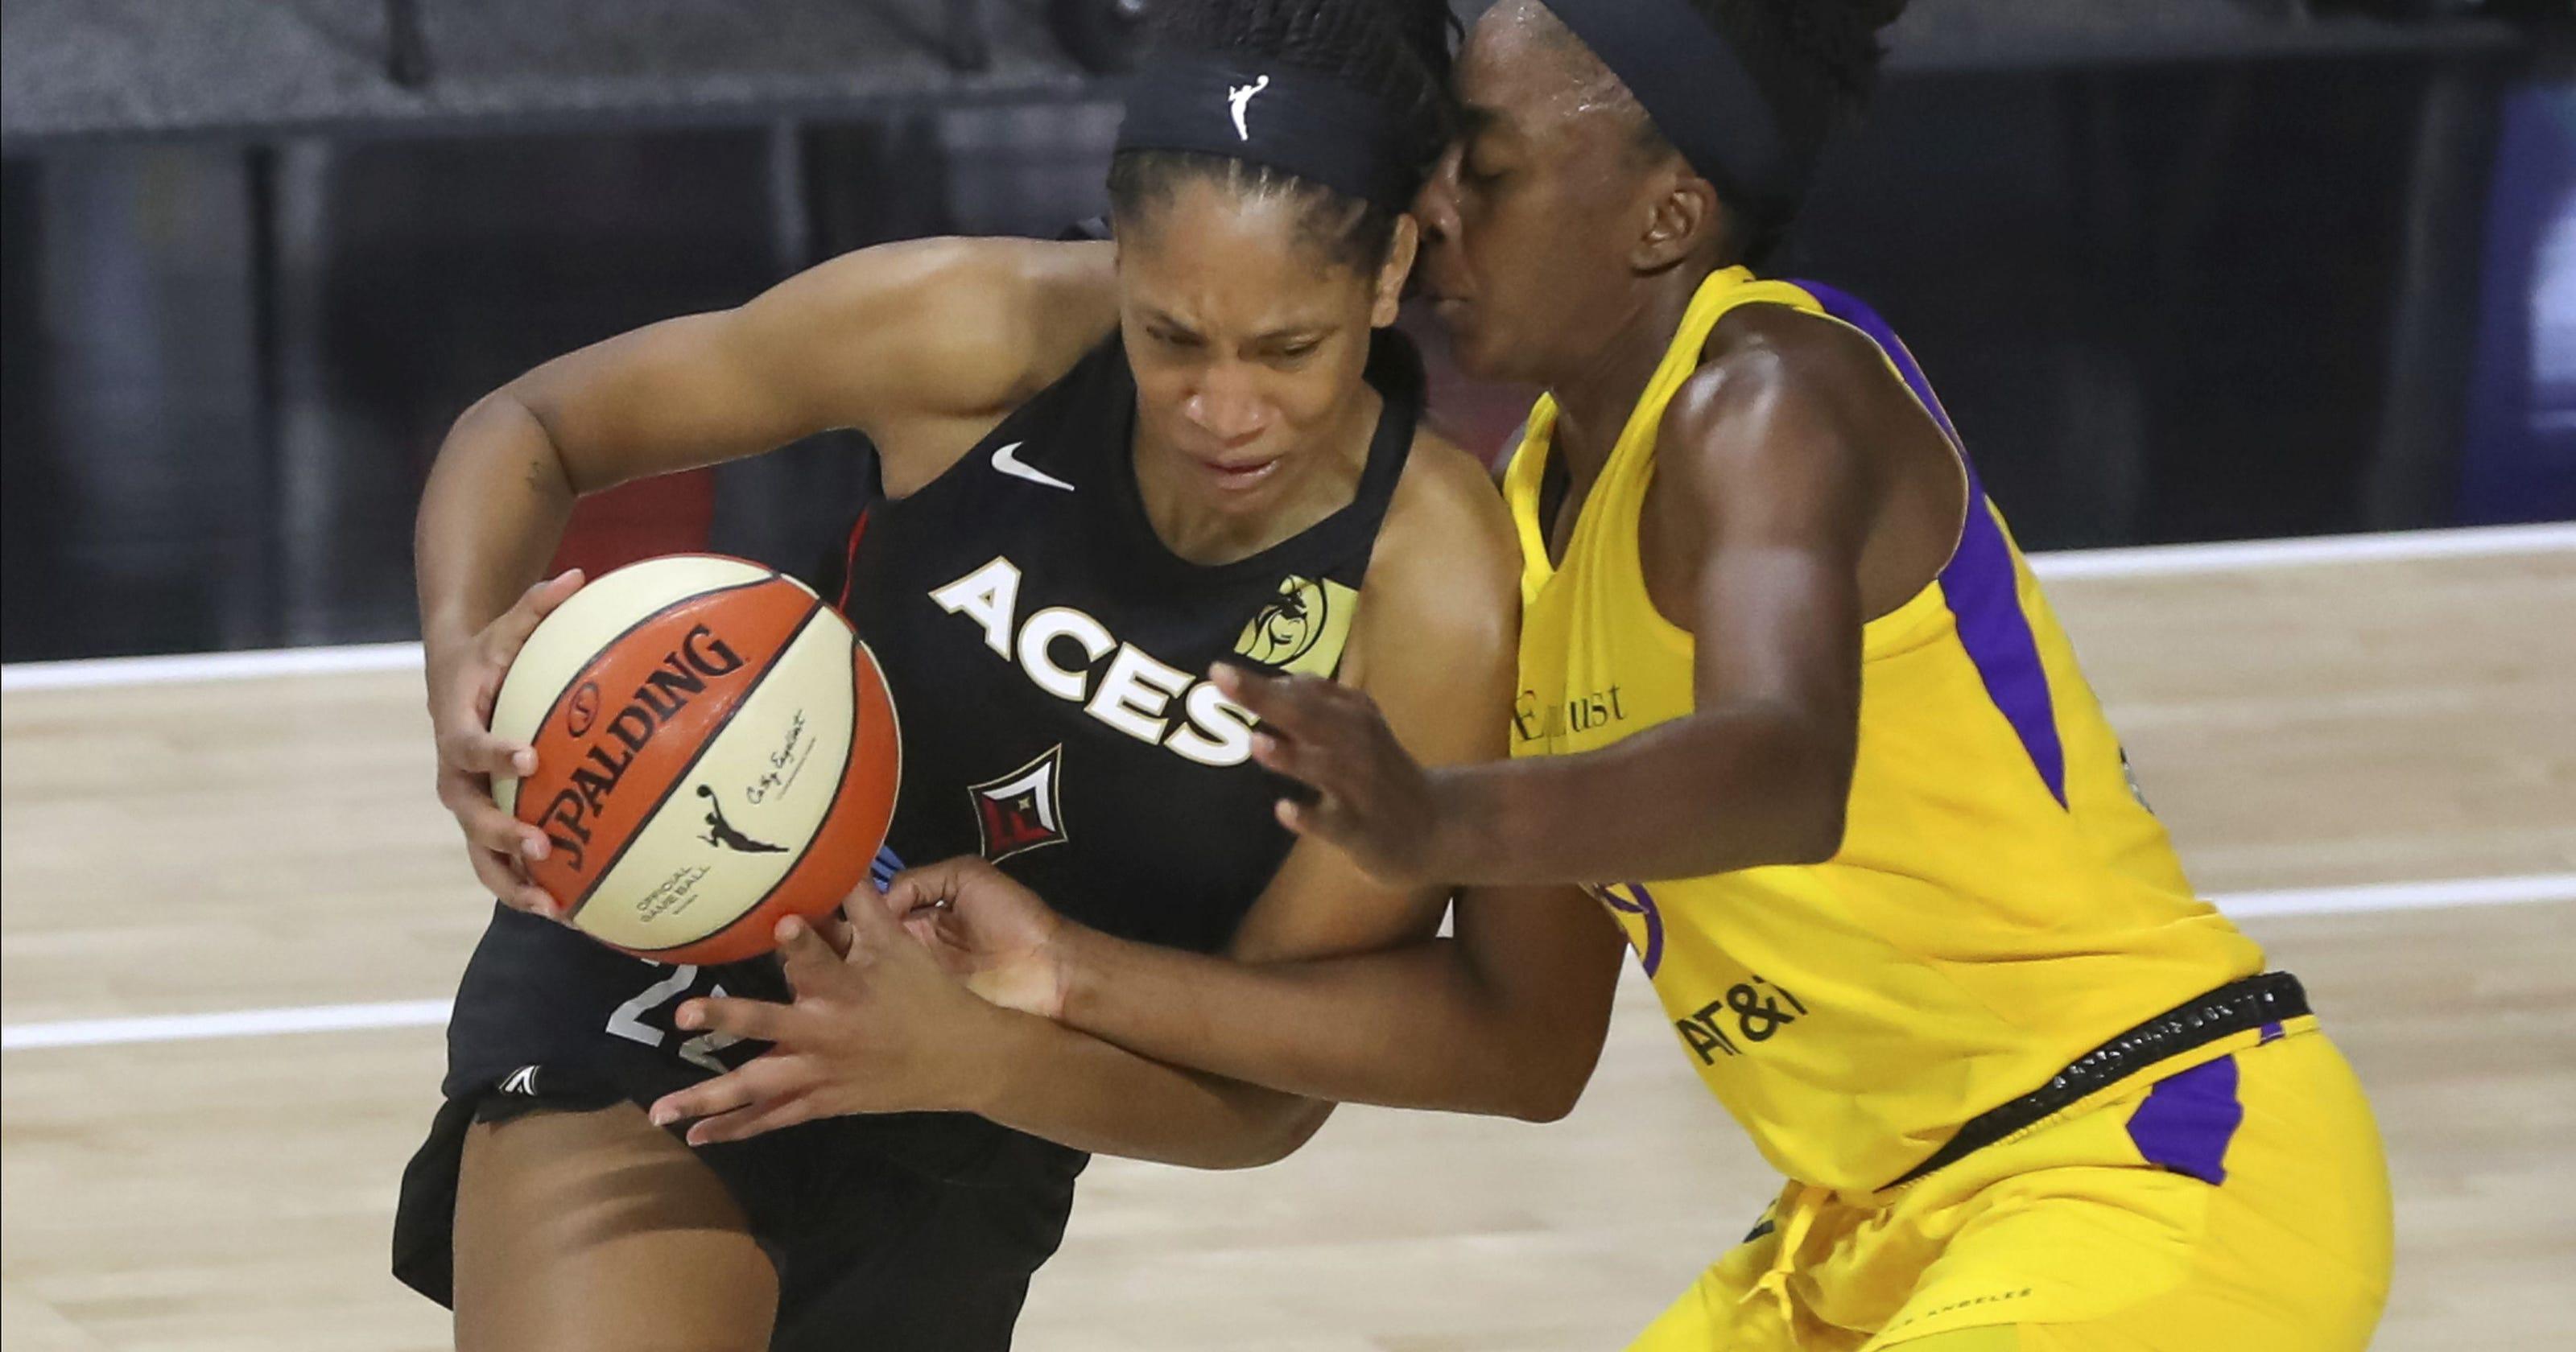 Las Vegas Aces star A'ja Wilson named 2020 WNBA Most Valuable Player